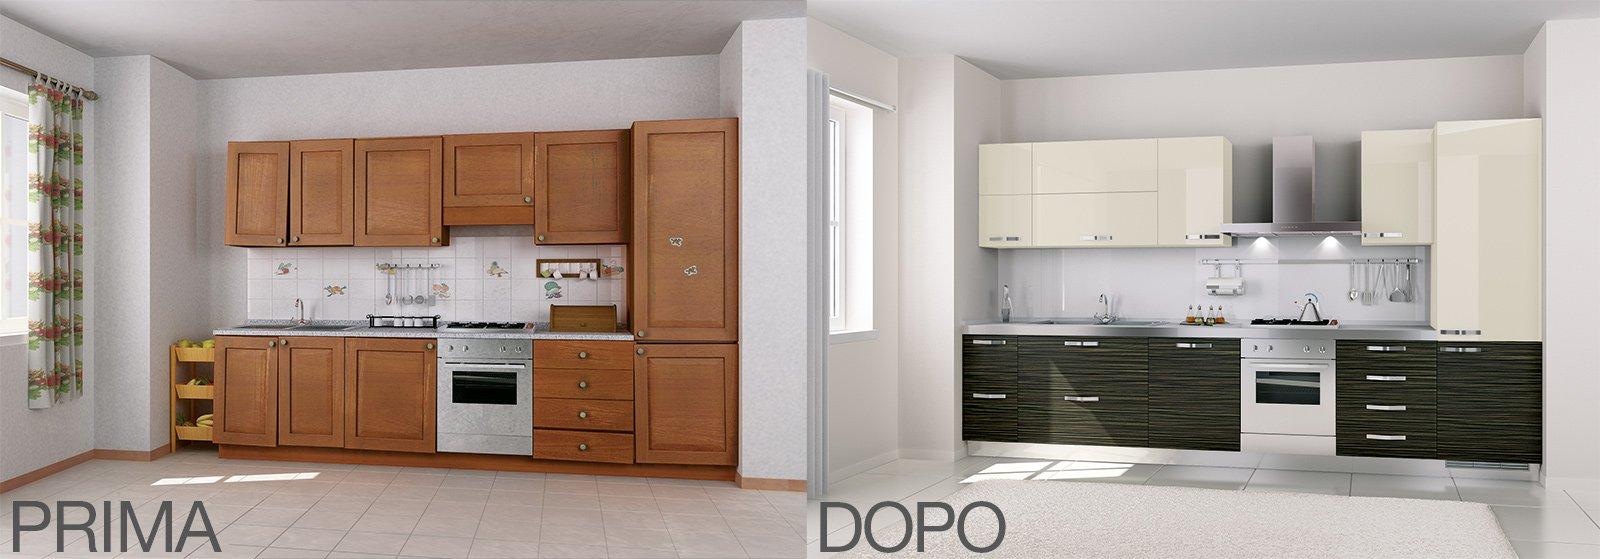 Top cucina ceramica rinnovare top cucina - Rinnovare mobili cucina ...